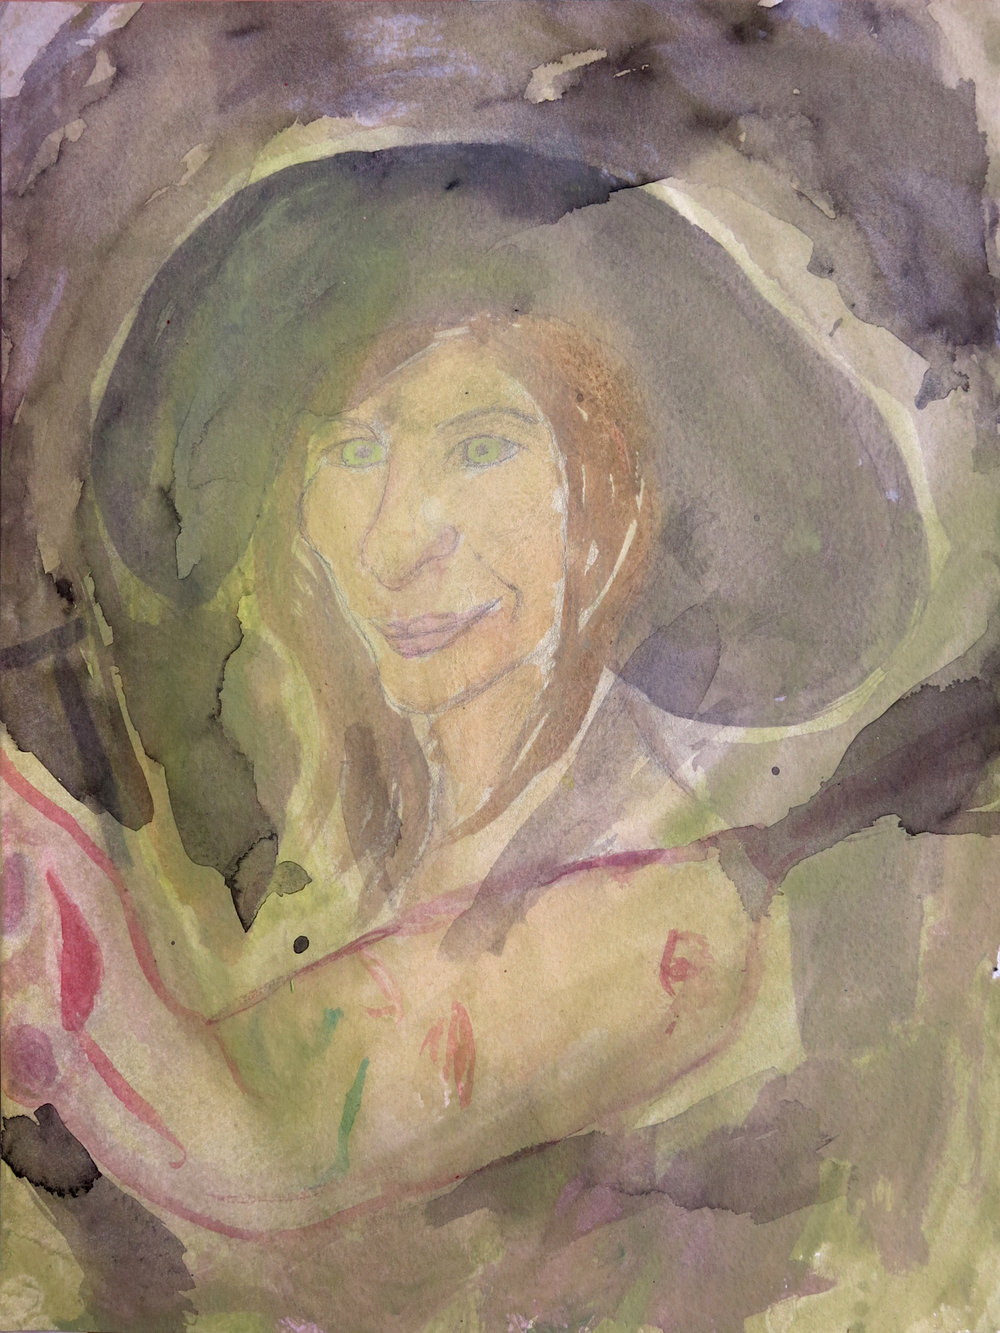 Barbra Streisand Portrait #141